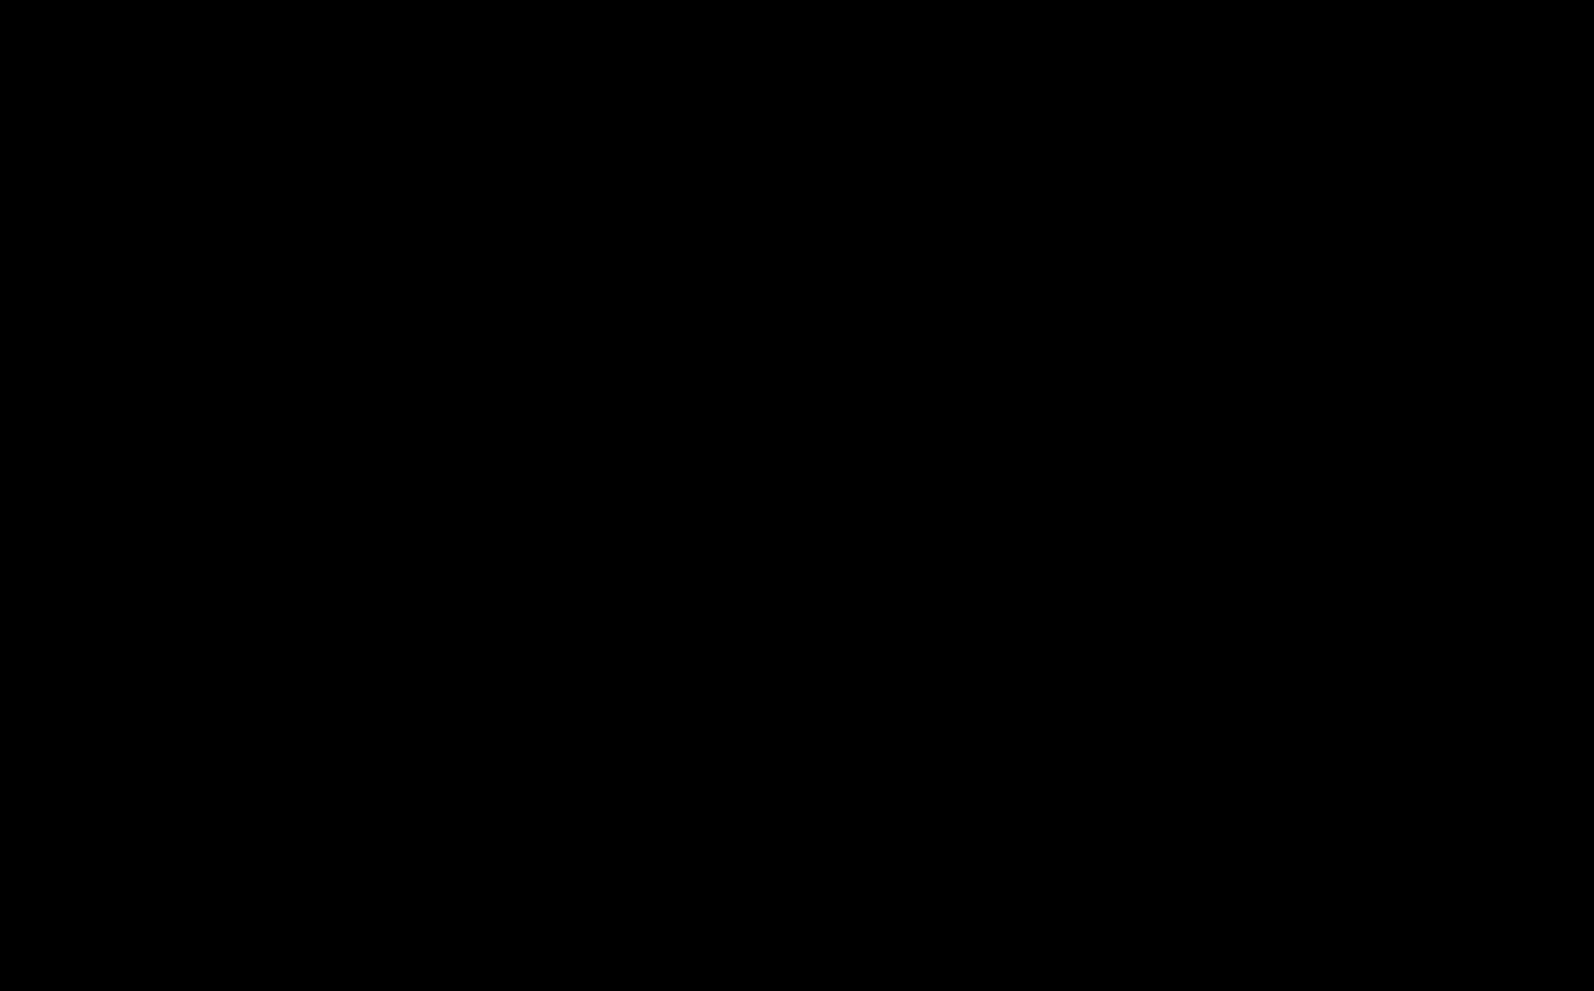 Dapagliflozin propylene glycolate hydrate